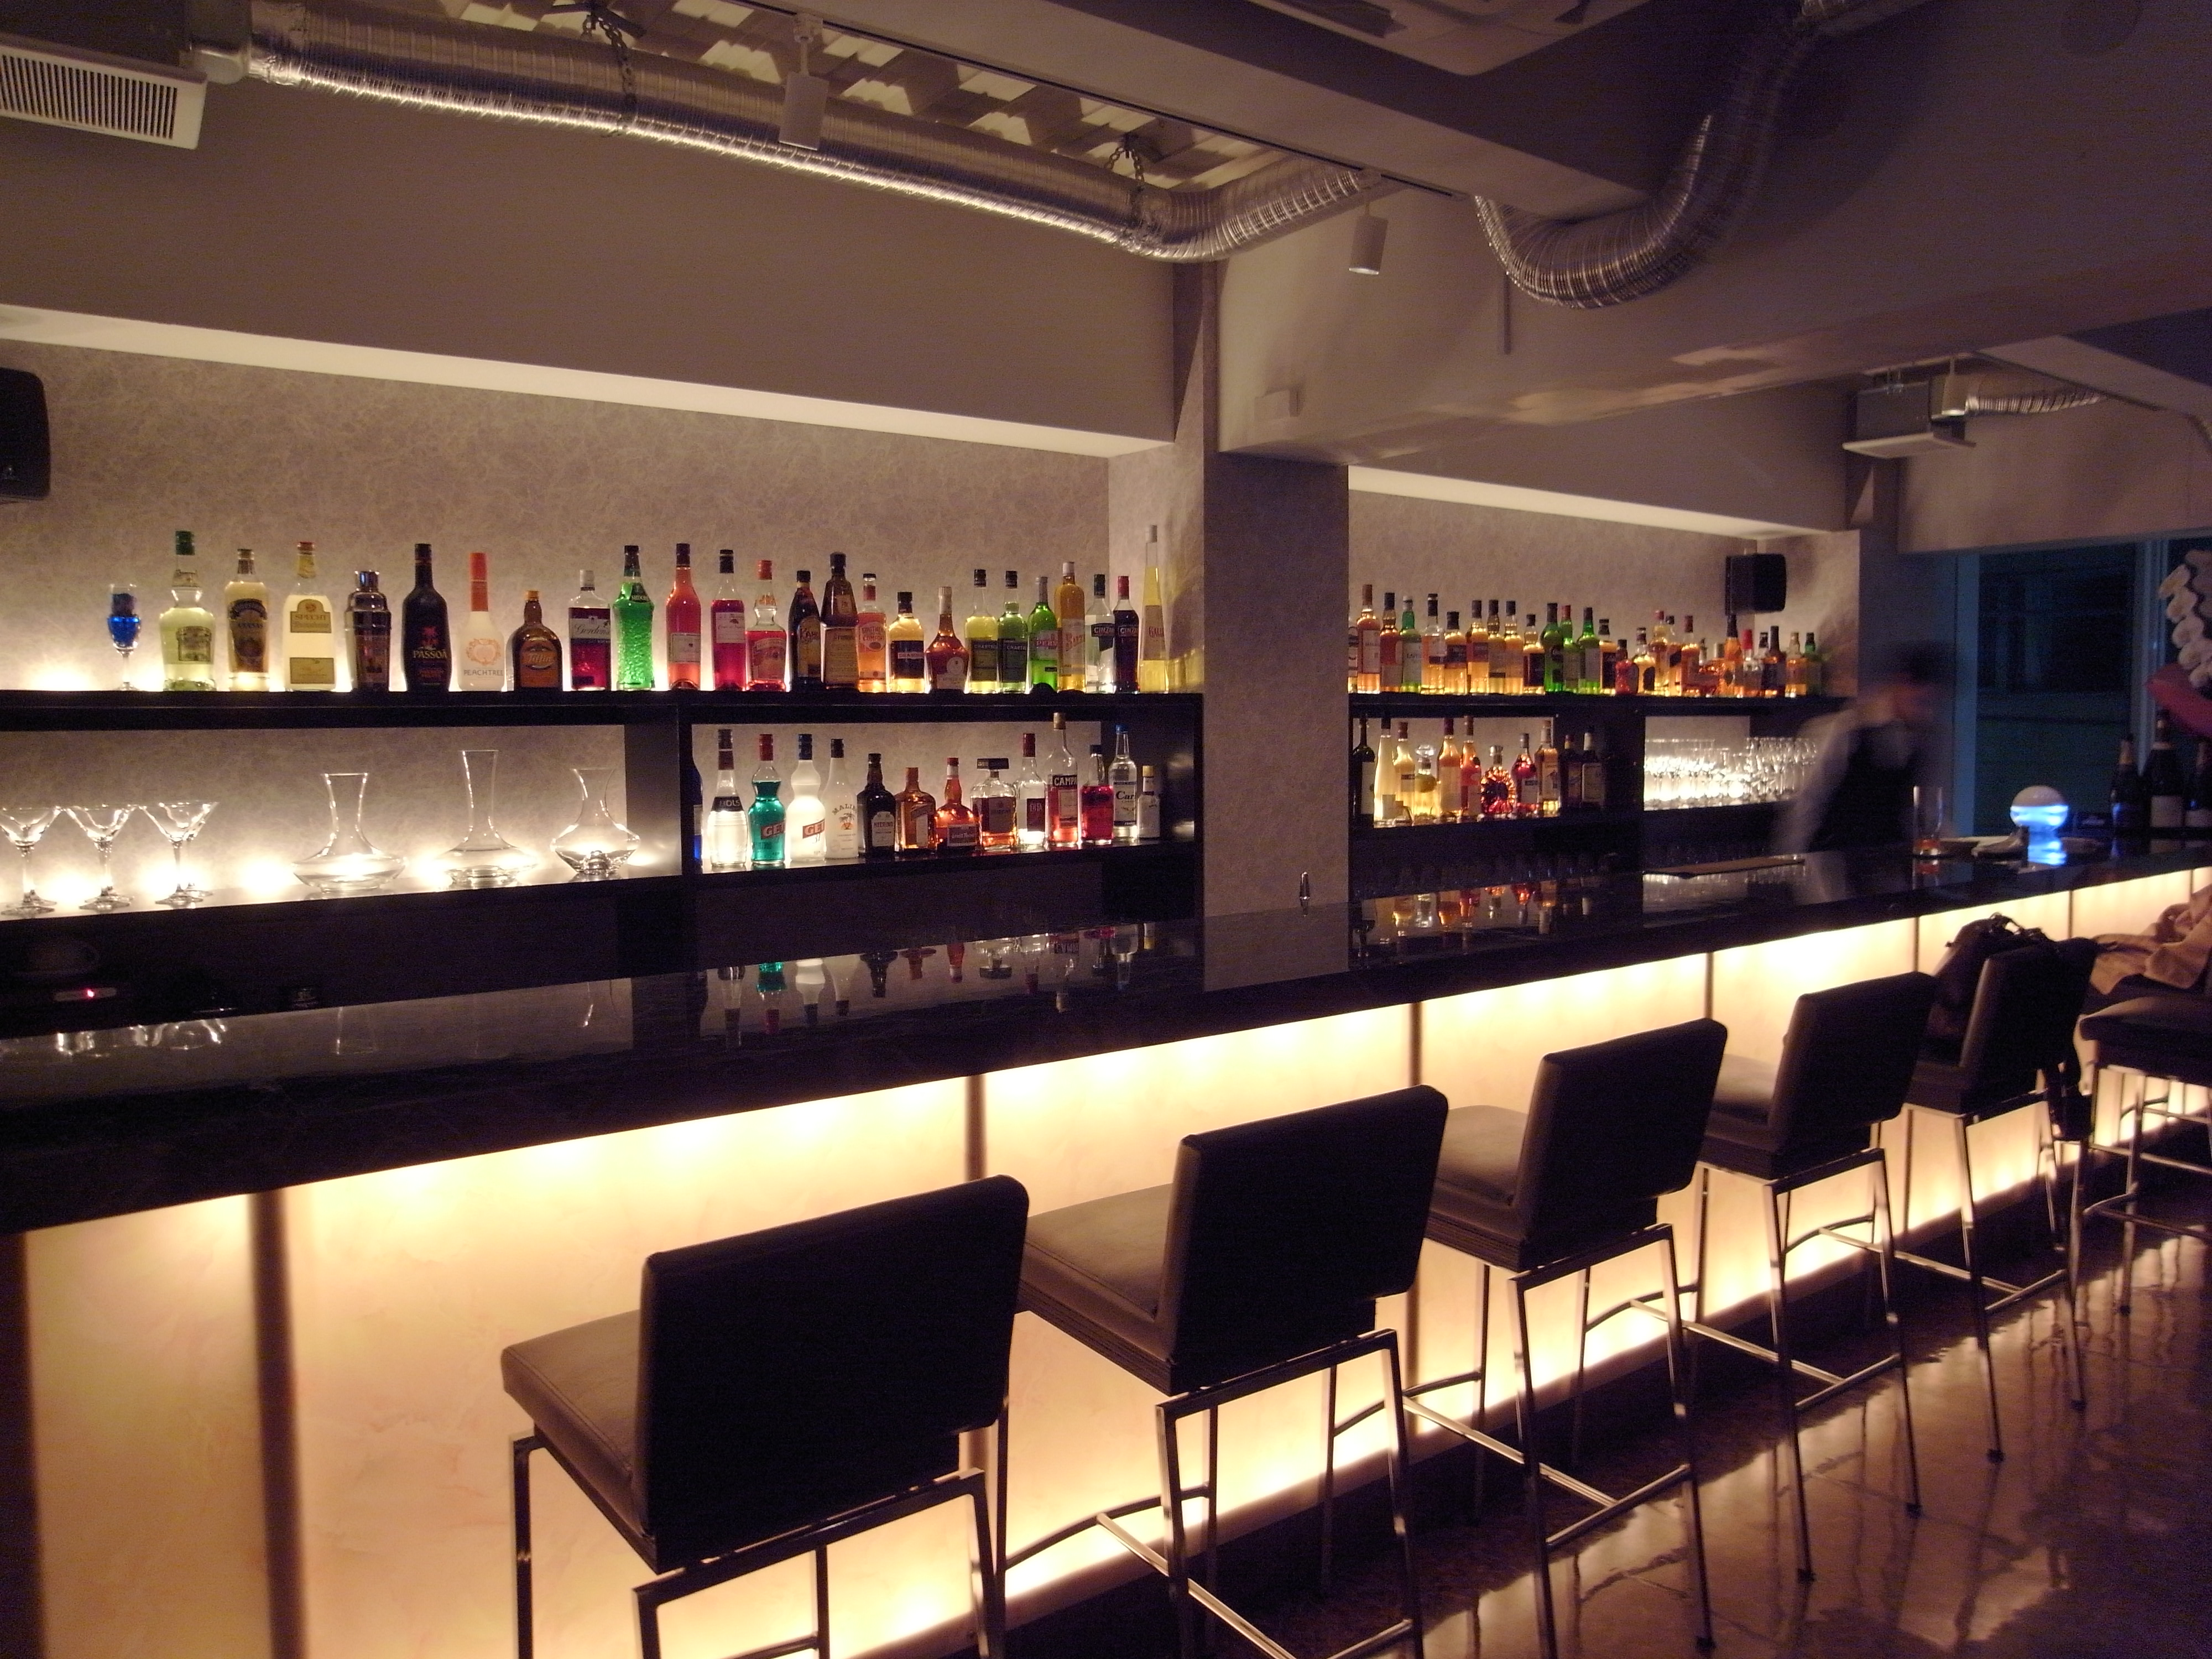 Top 28 Bar Counter At Home Design 27 Basement Bars That Bring Home The Good Times Bar